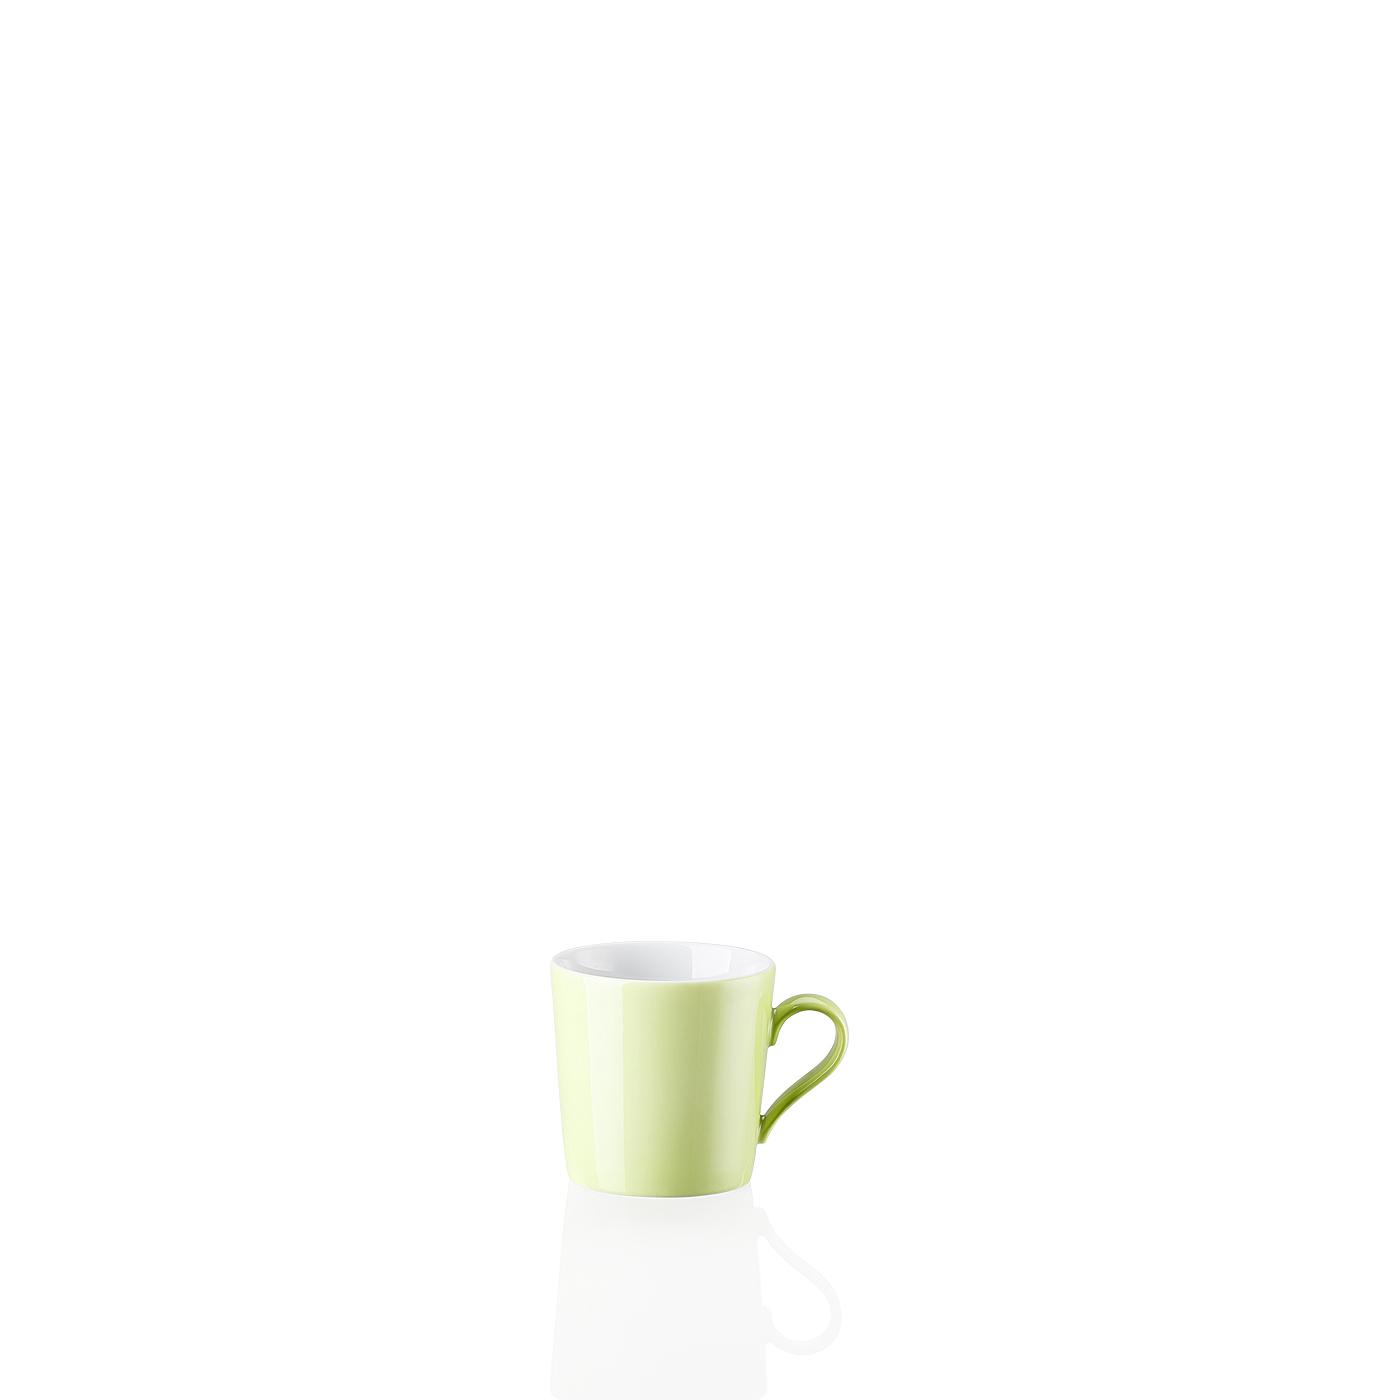 Espresso-/Mokka-Obertasse Tric Grün Arzberg